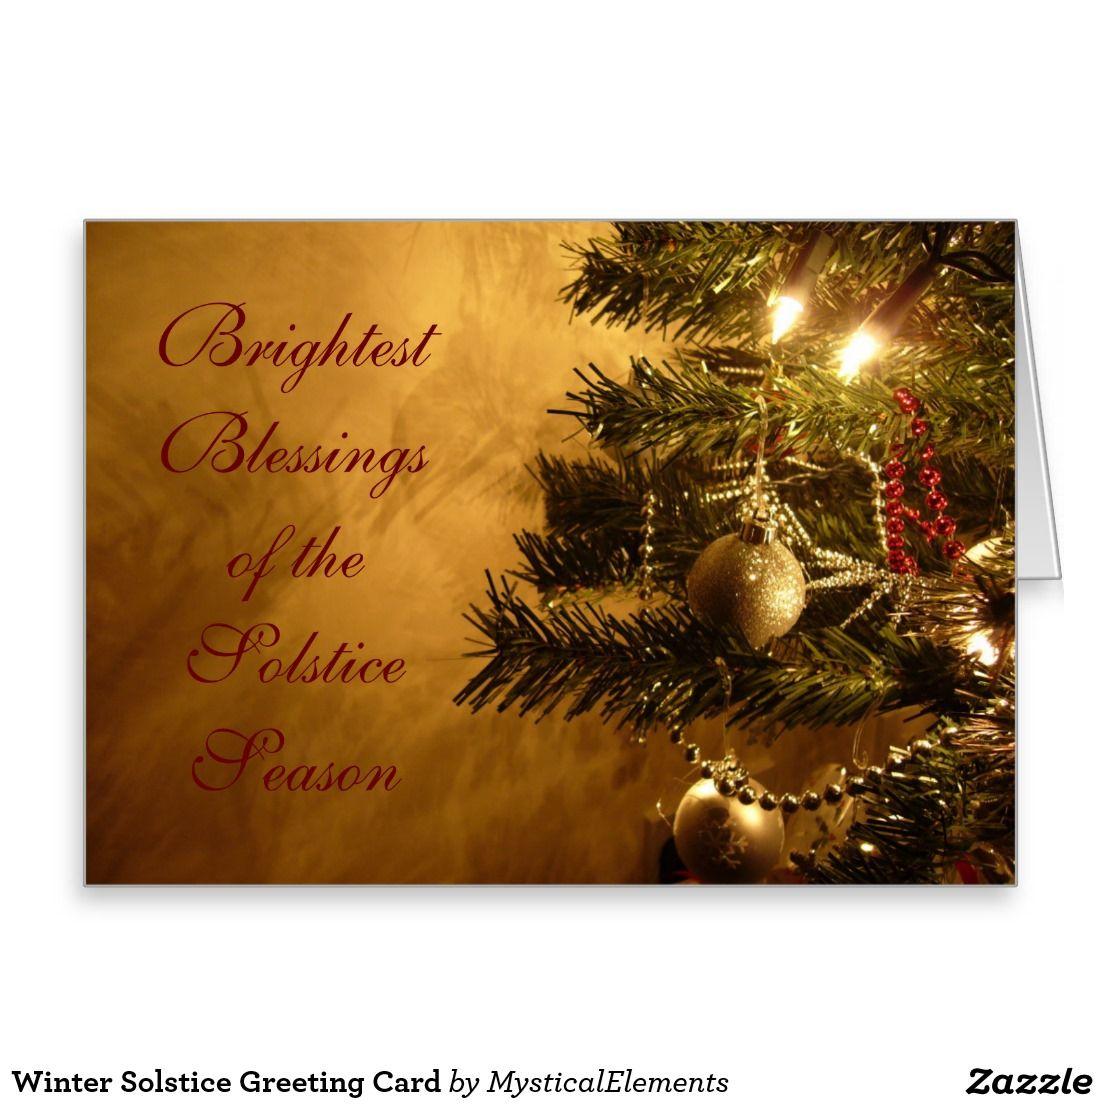 Winter solstice greeting card winter solstice winter solstice greeting card m4hsunfo